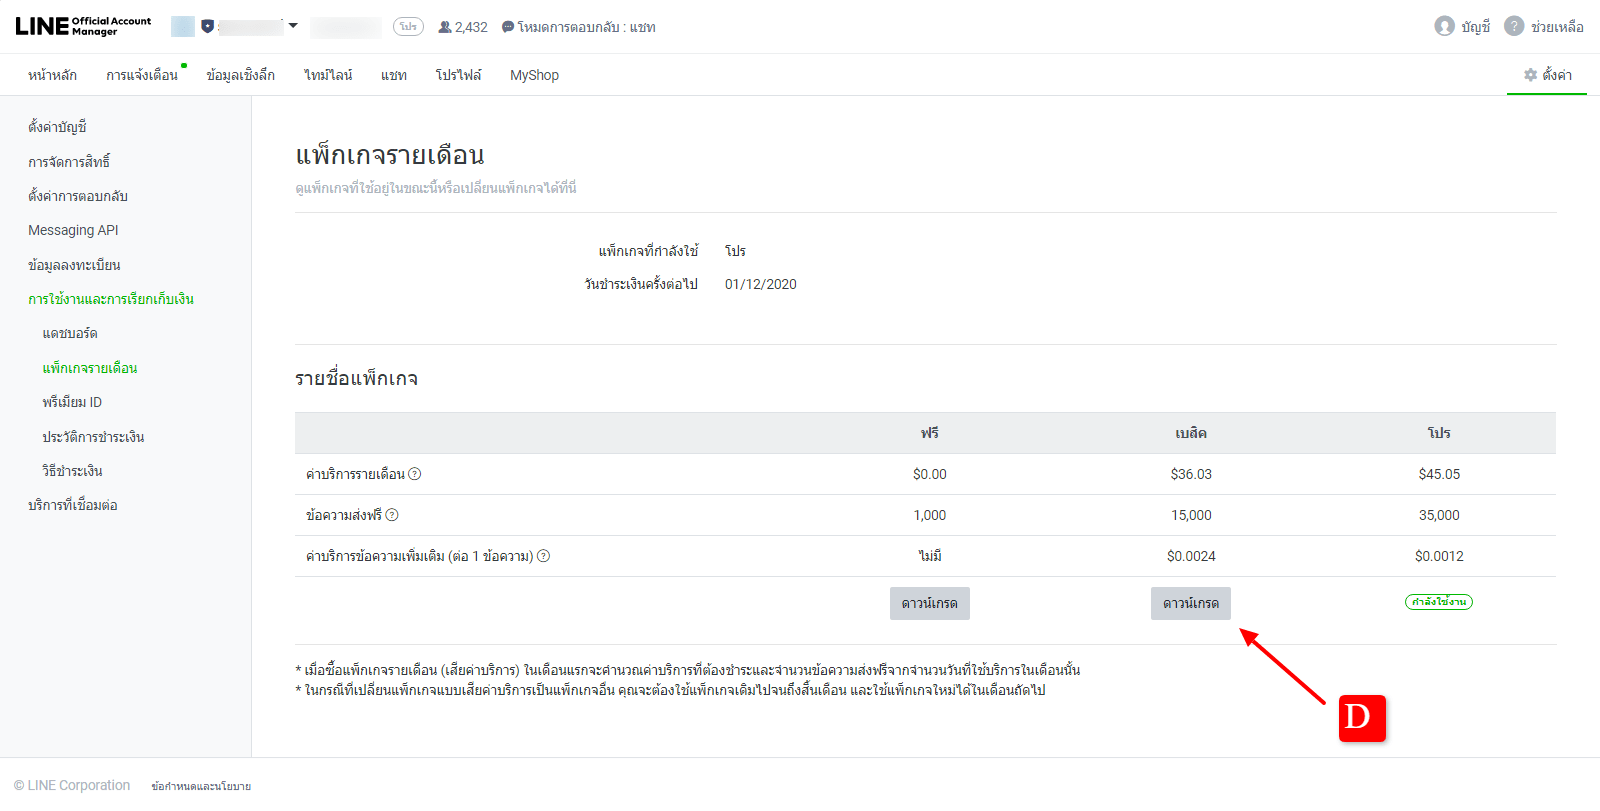 LINE Official Account Downgrade 2021